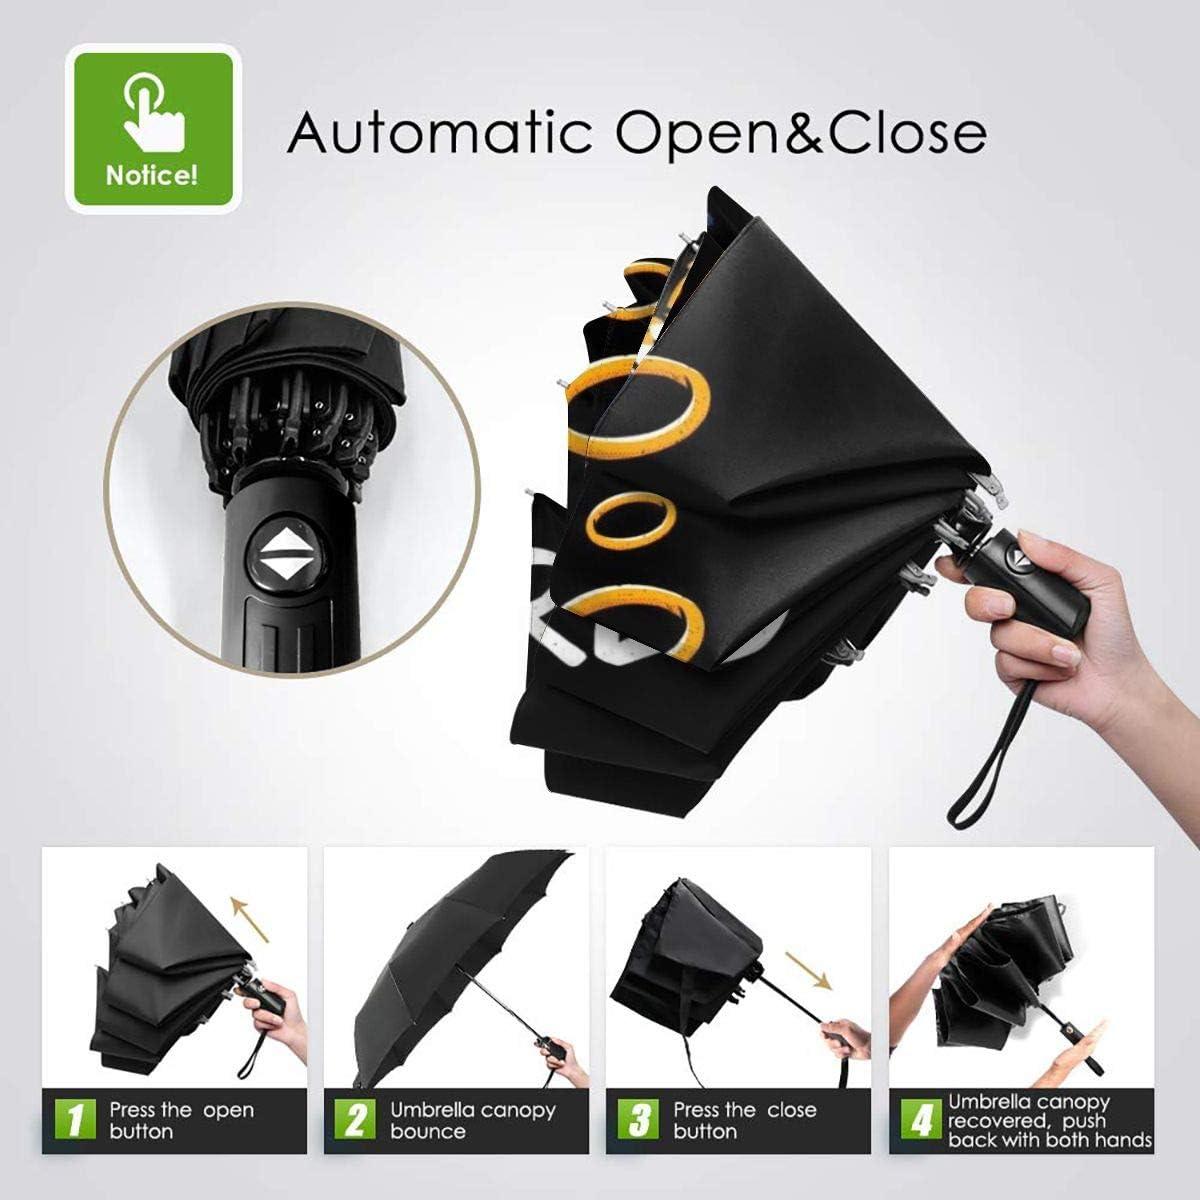 Tired Sonic Windproof Compact Auto Open And Close Folding Umbrella,Automatic Foldable Travel Parasol Umbrella